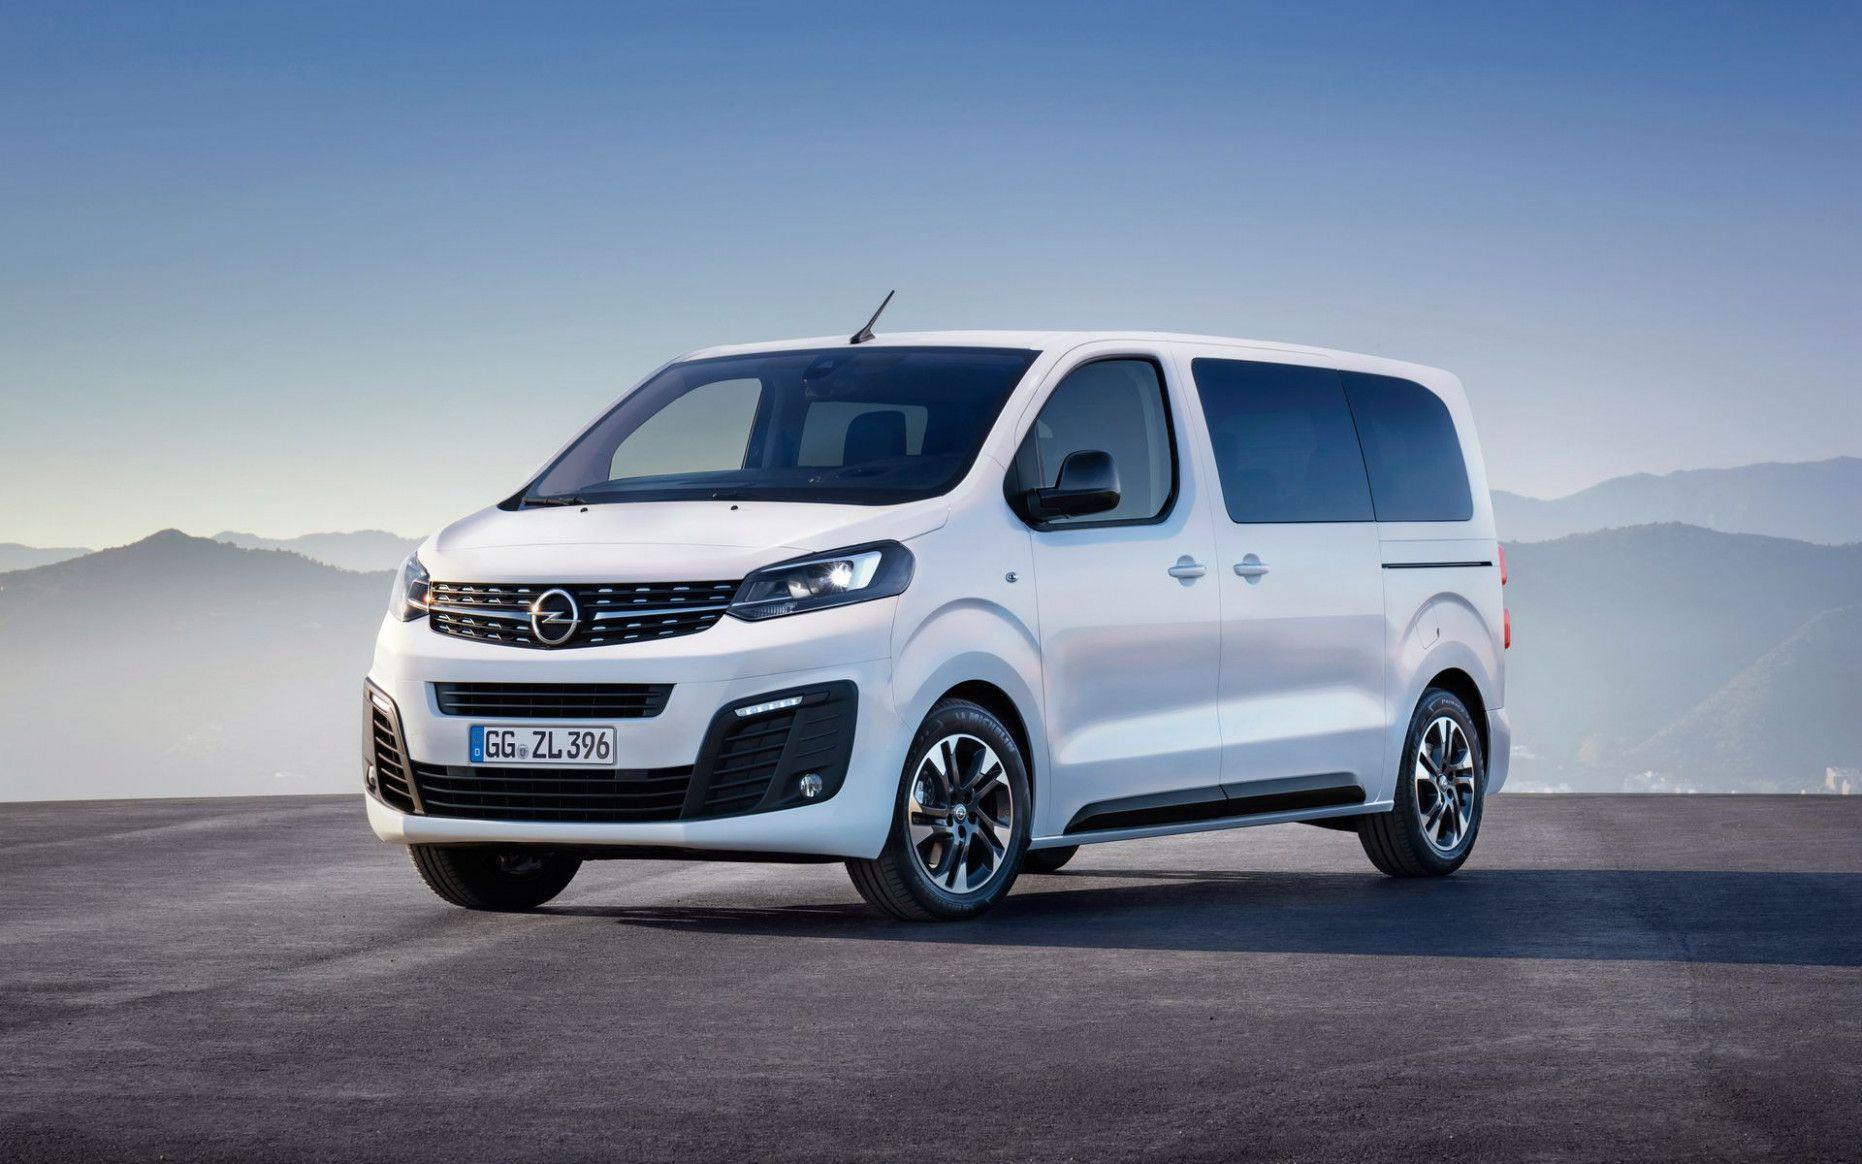 8 Picture Opel Zafira 2020 Price In 2020 Mini Van Opel New Engine